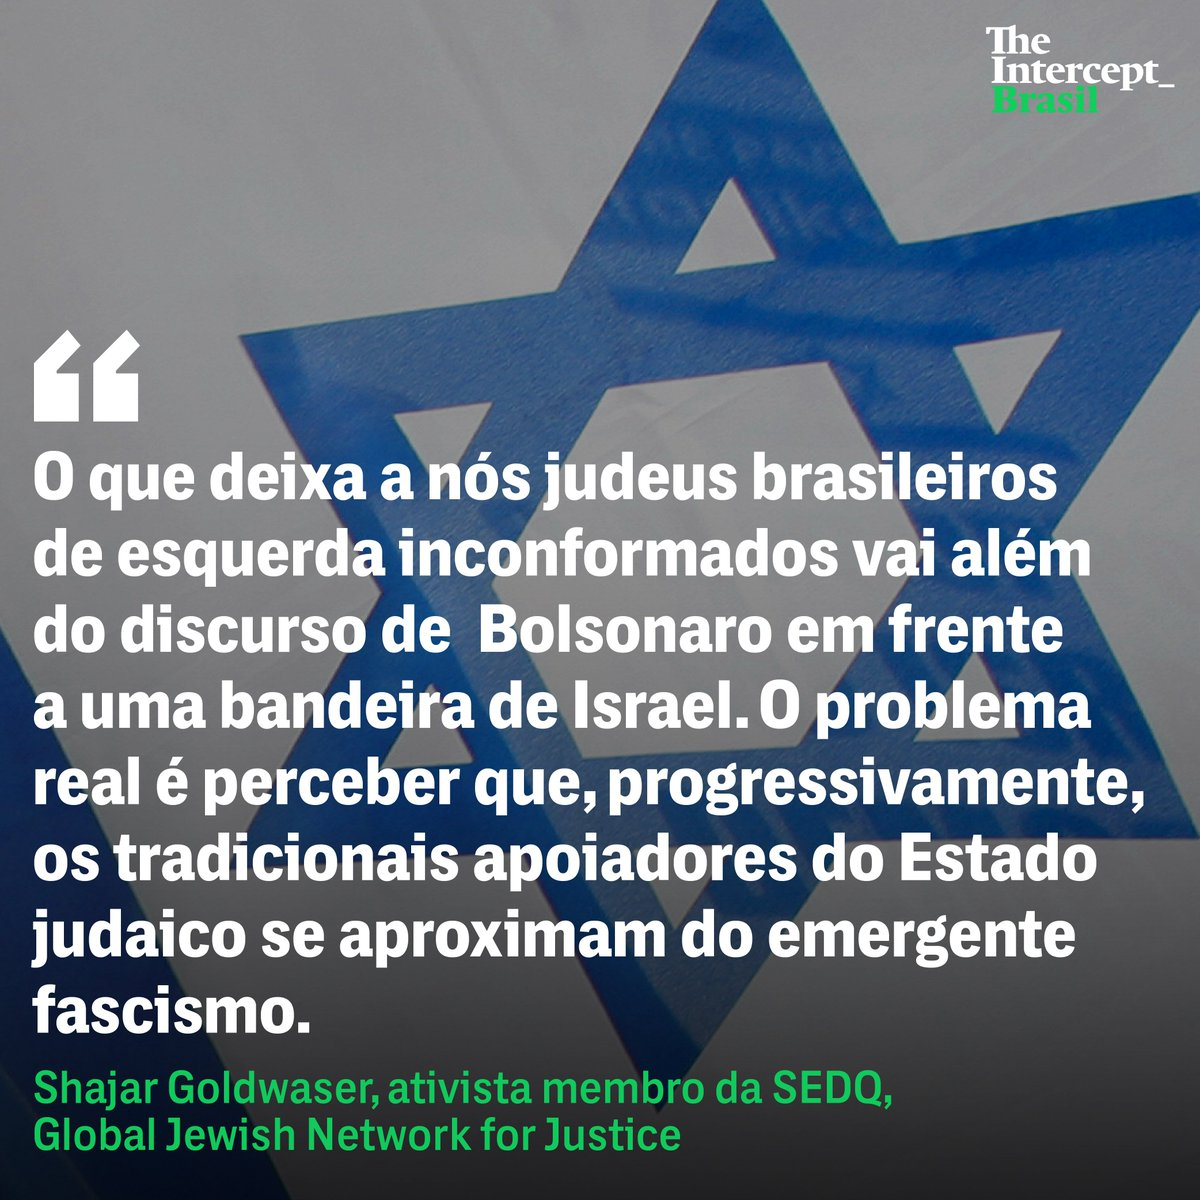 "The Intercept Brasil on Twitter: ""Jair Bolsonaro na Hebraica mostra o racha irreconciliável entre ser esquerda e sionista https://t.co/Y4eIAG7C9R… """